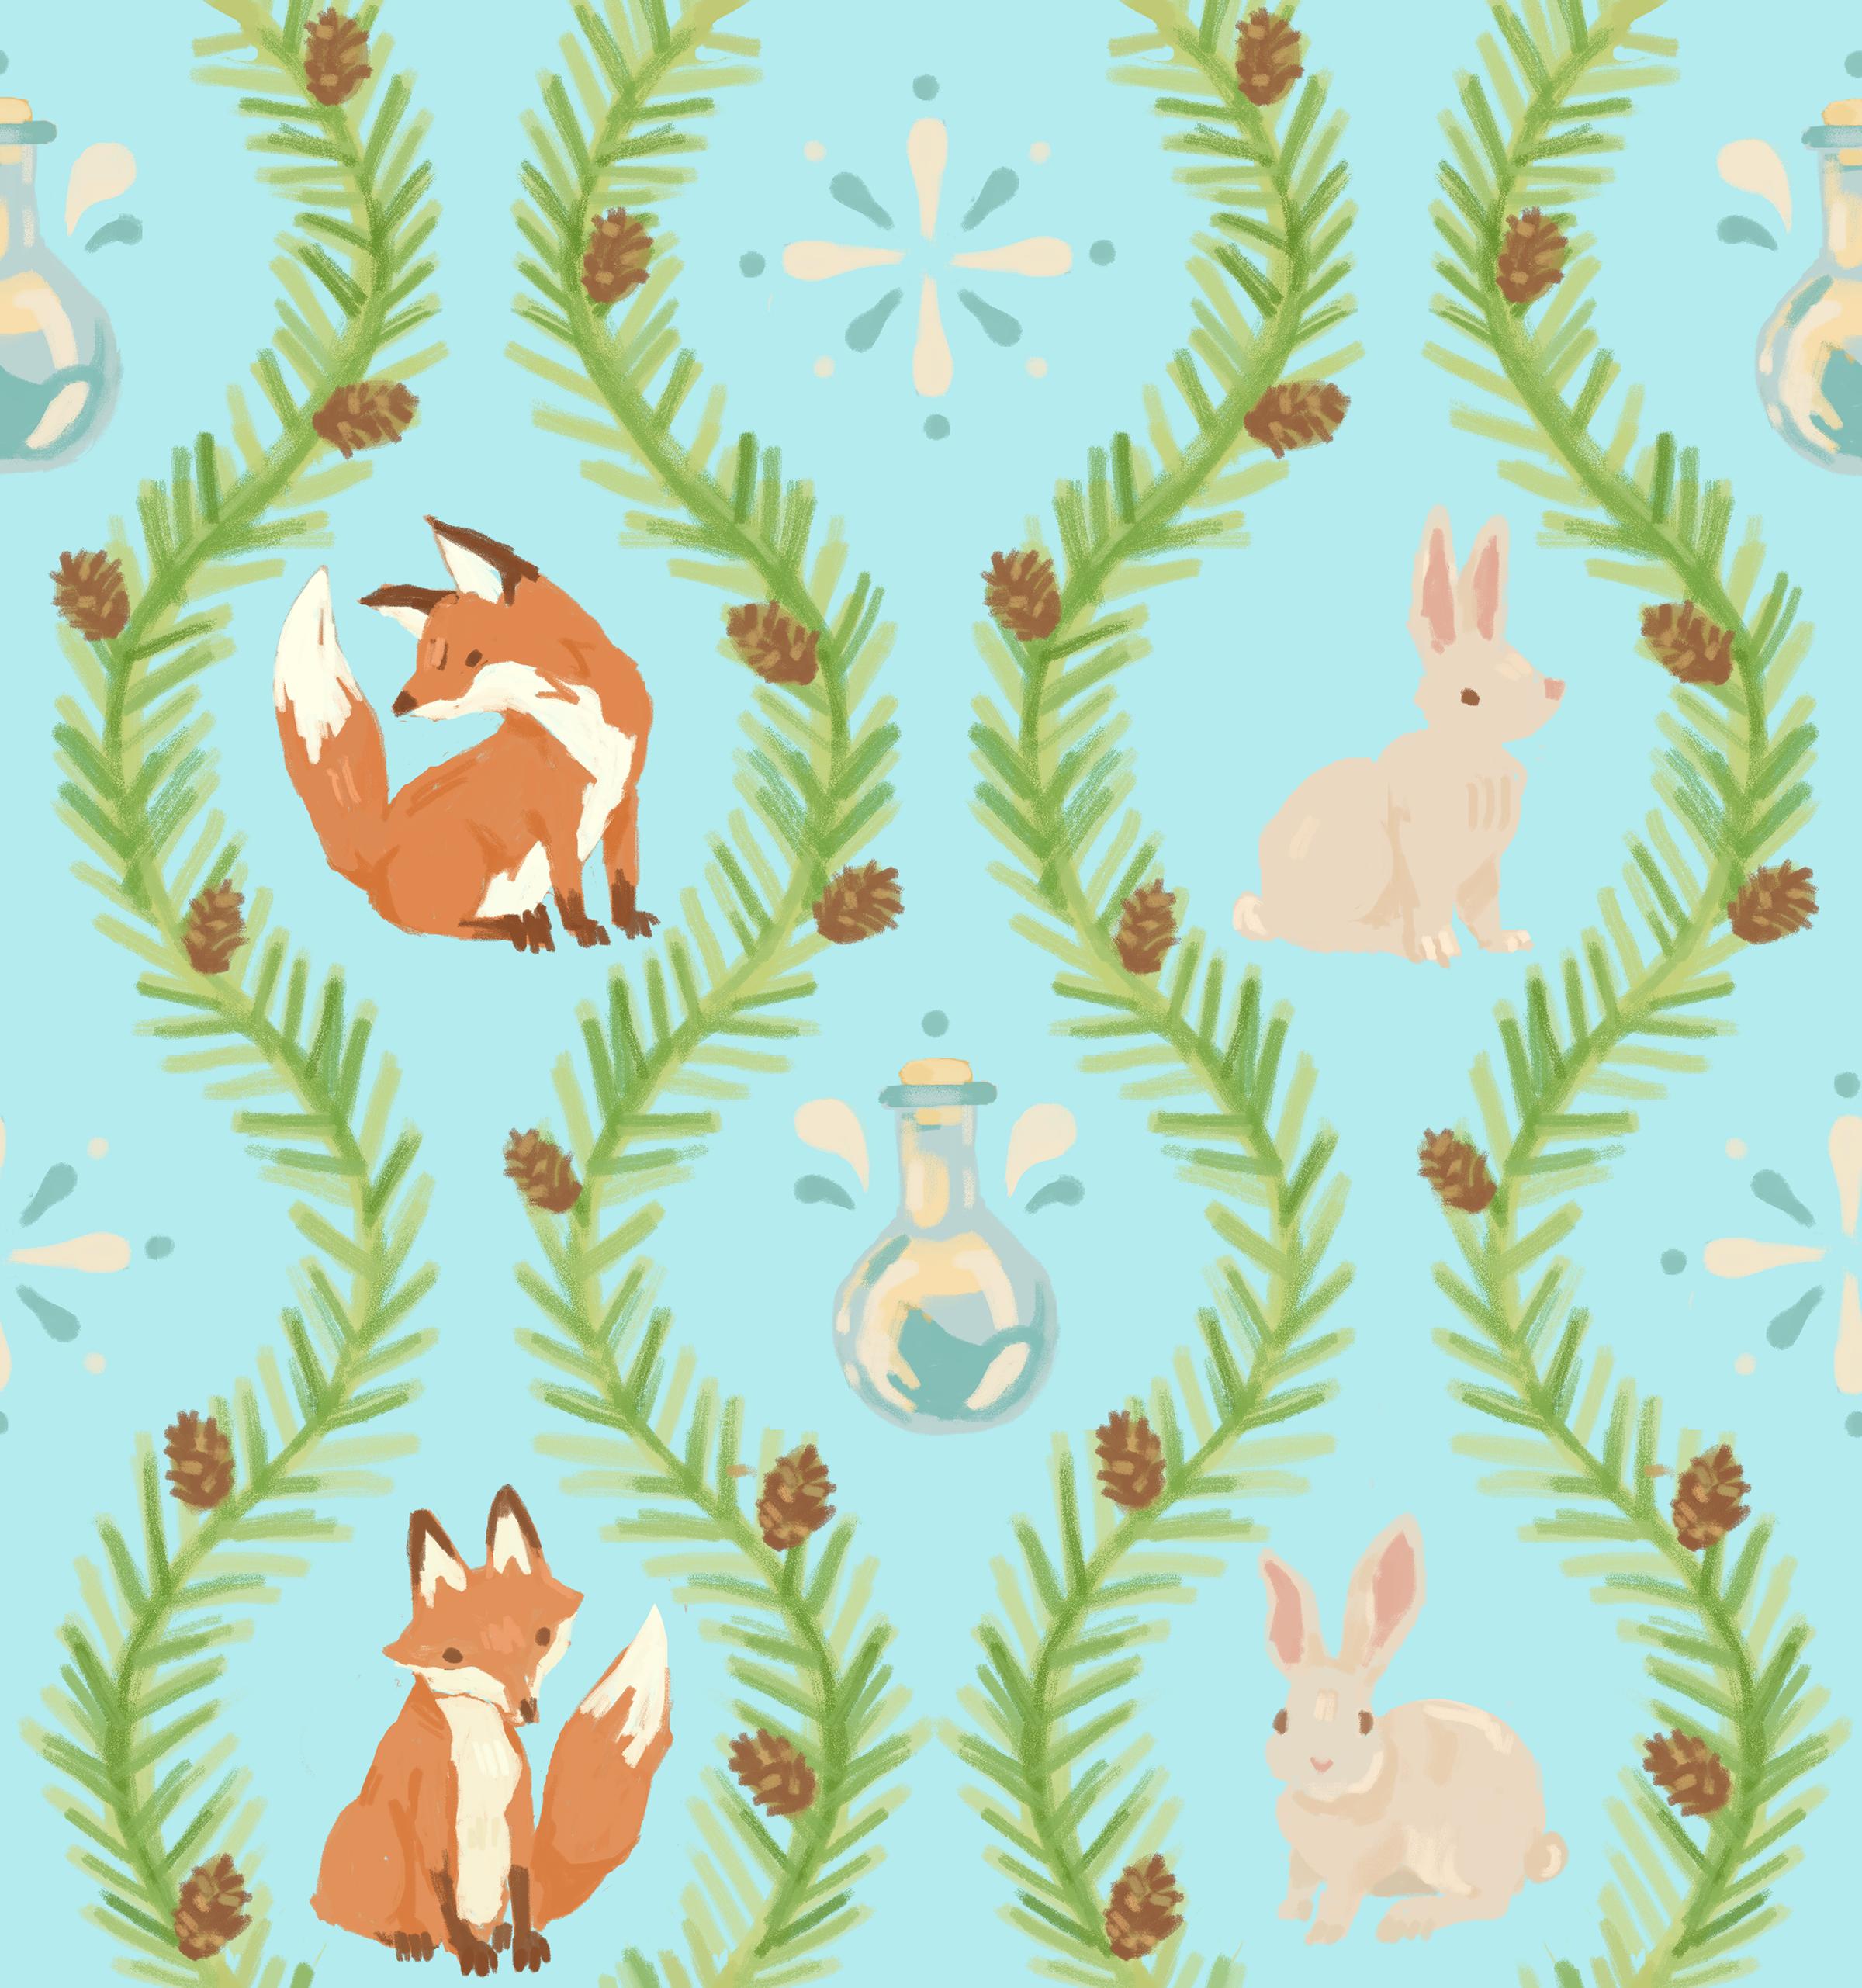 final wallpaper concept